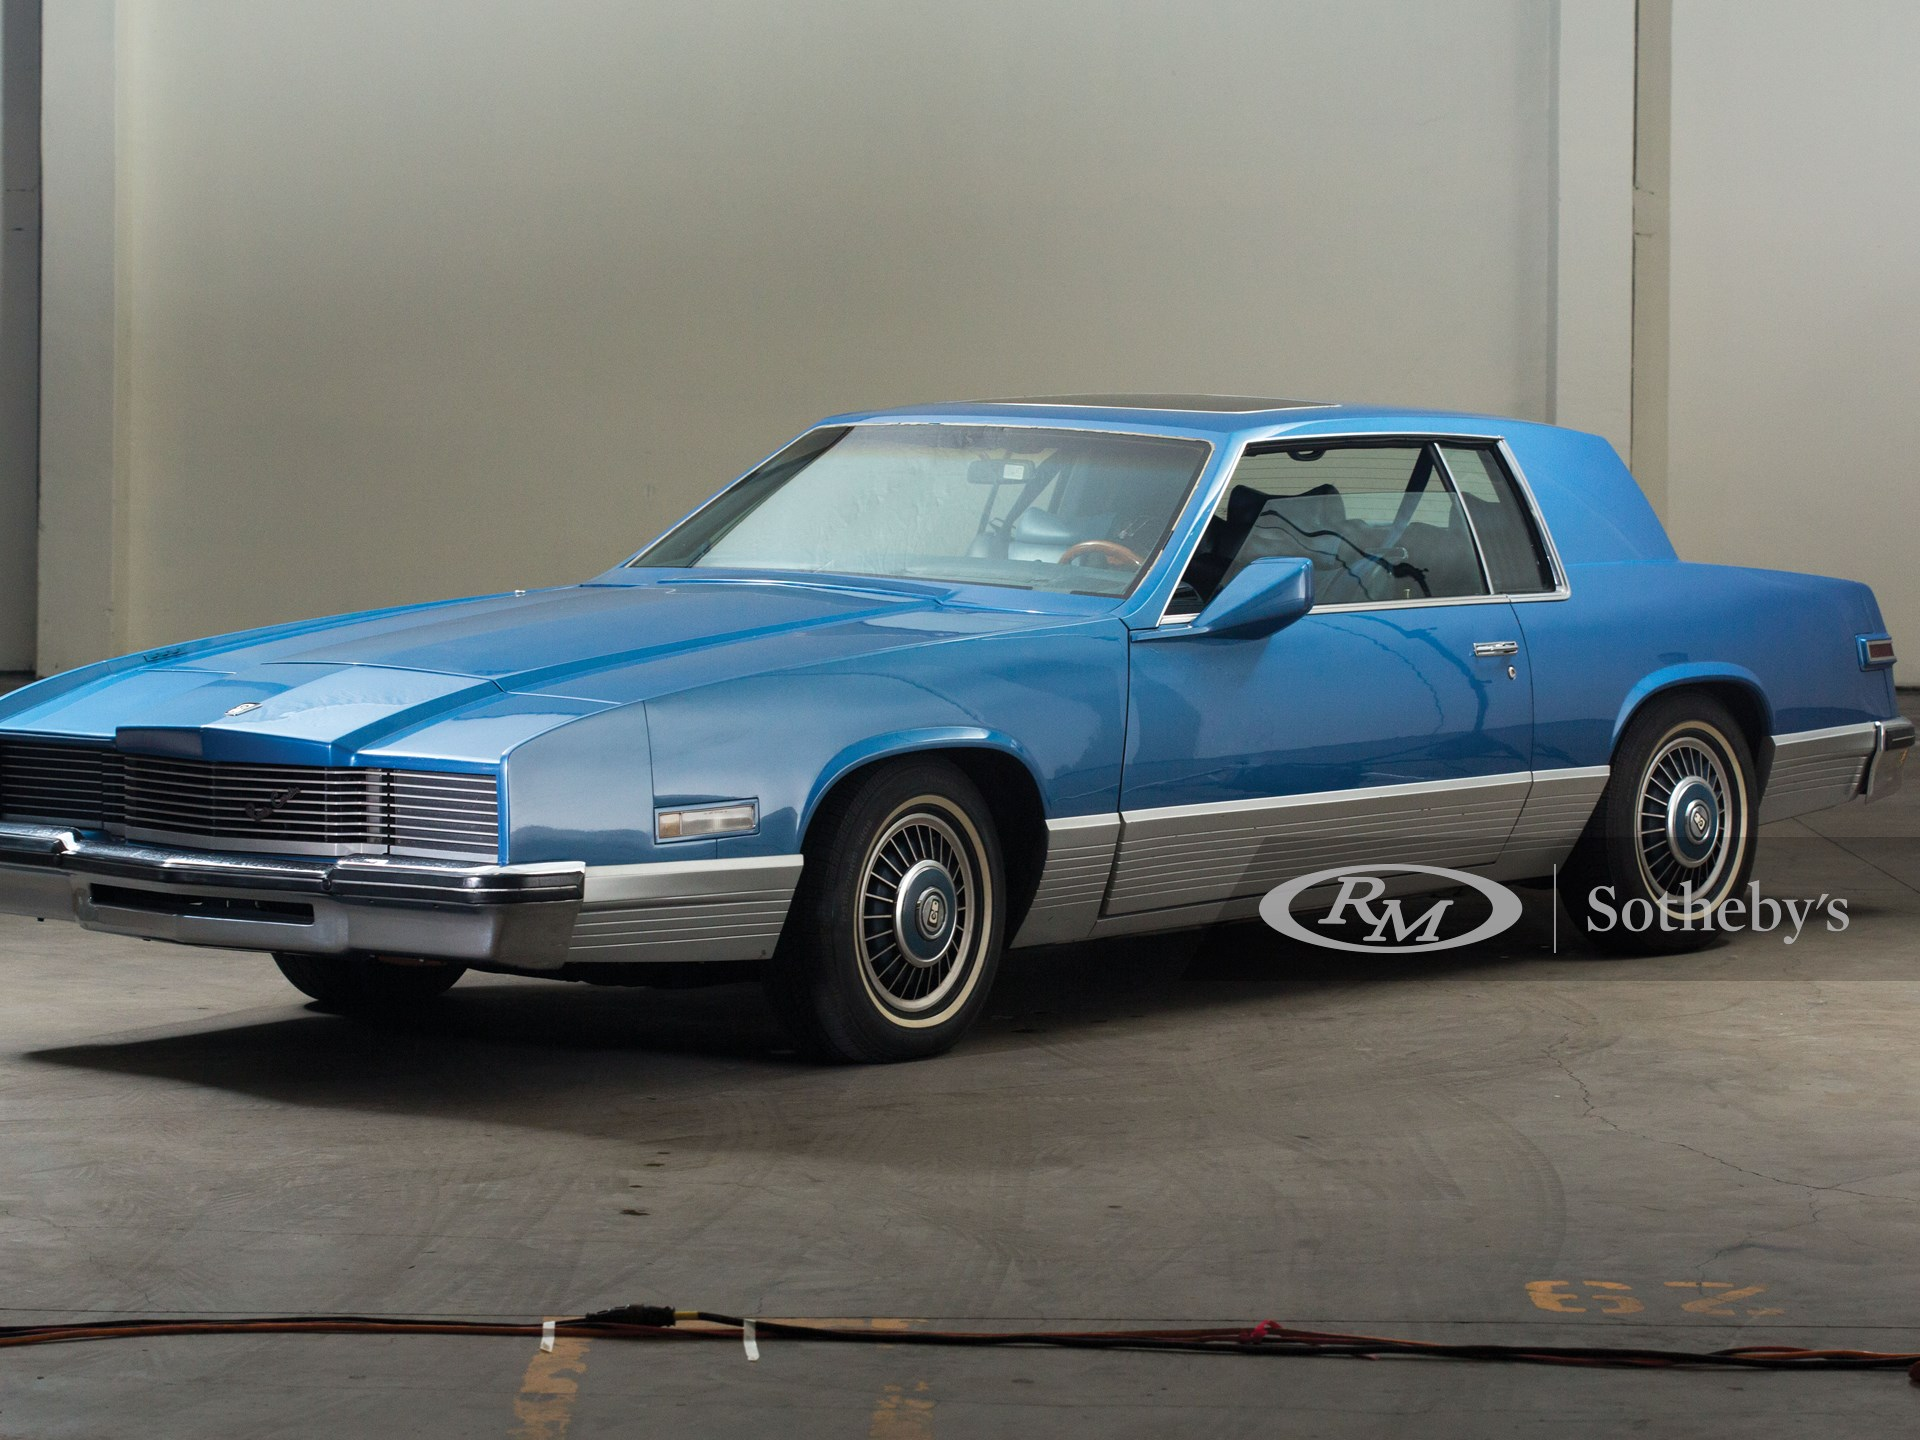 1981 cadillac eldorado california 2013 rm auctions 1981 cadillac eldorado california